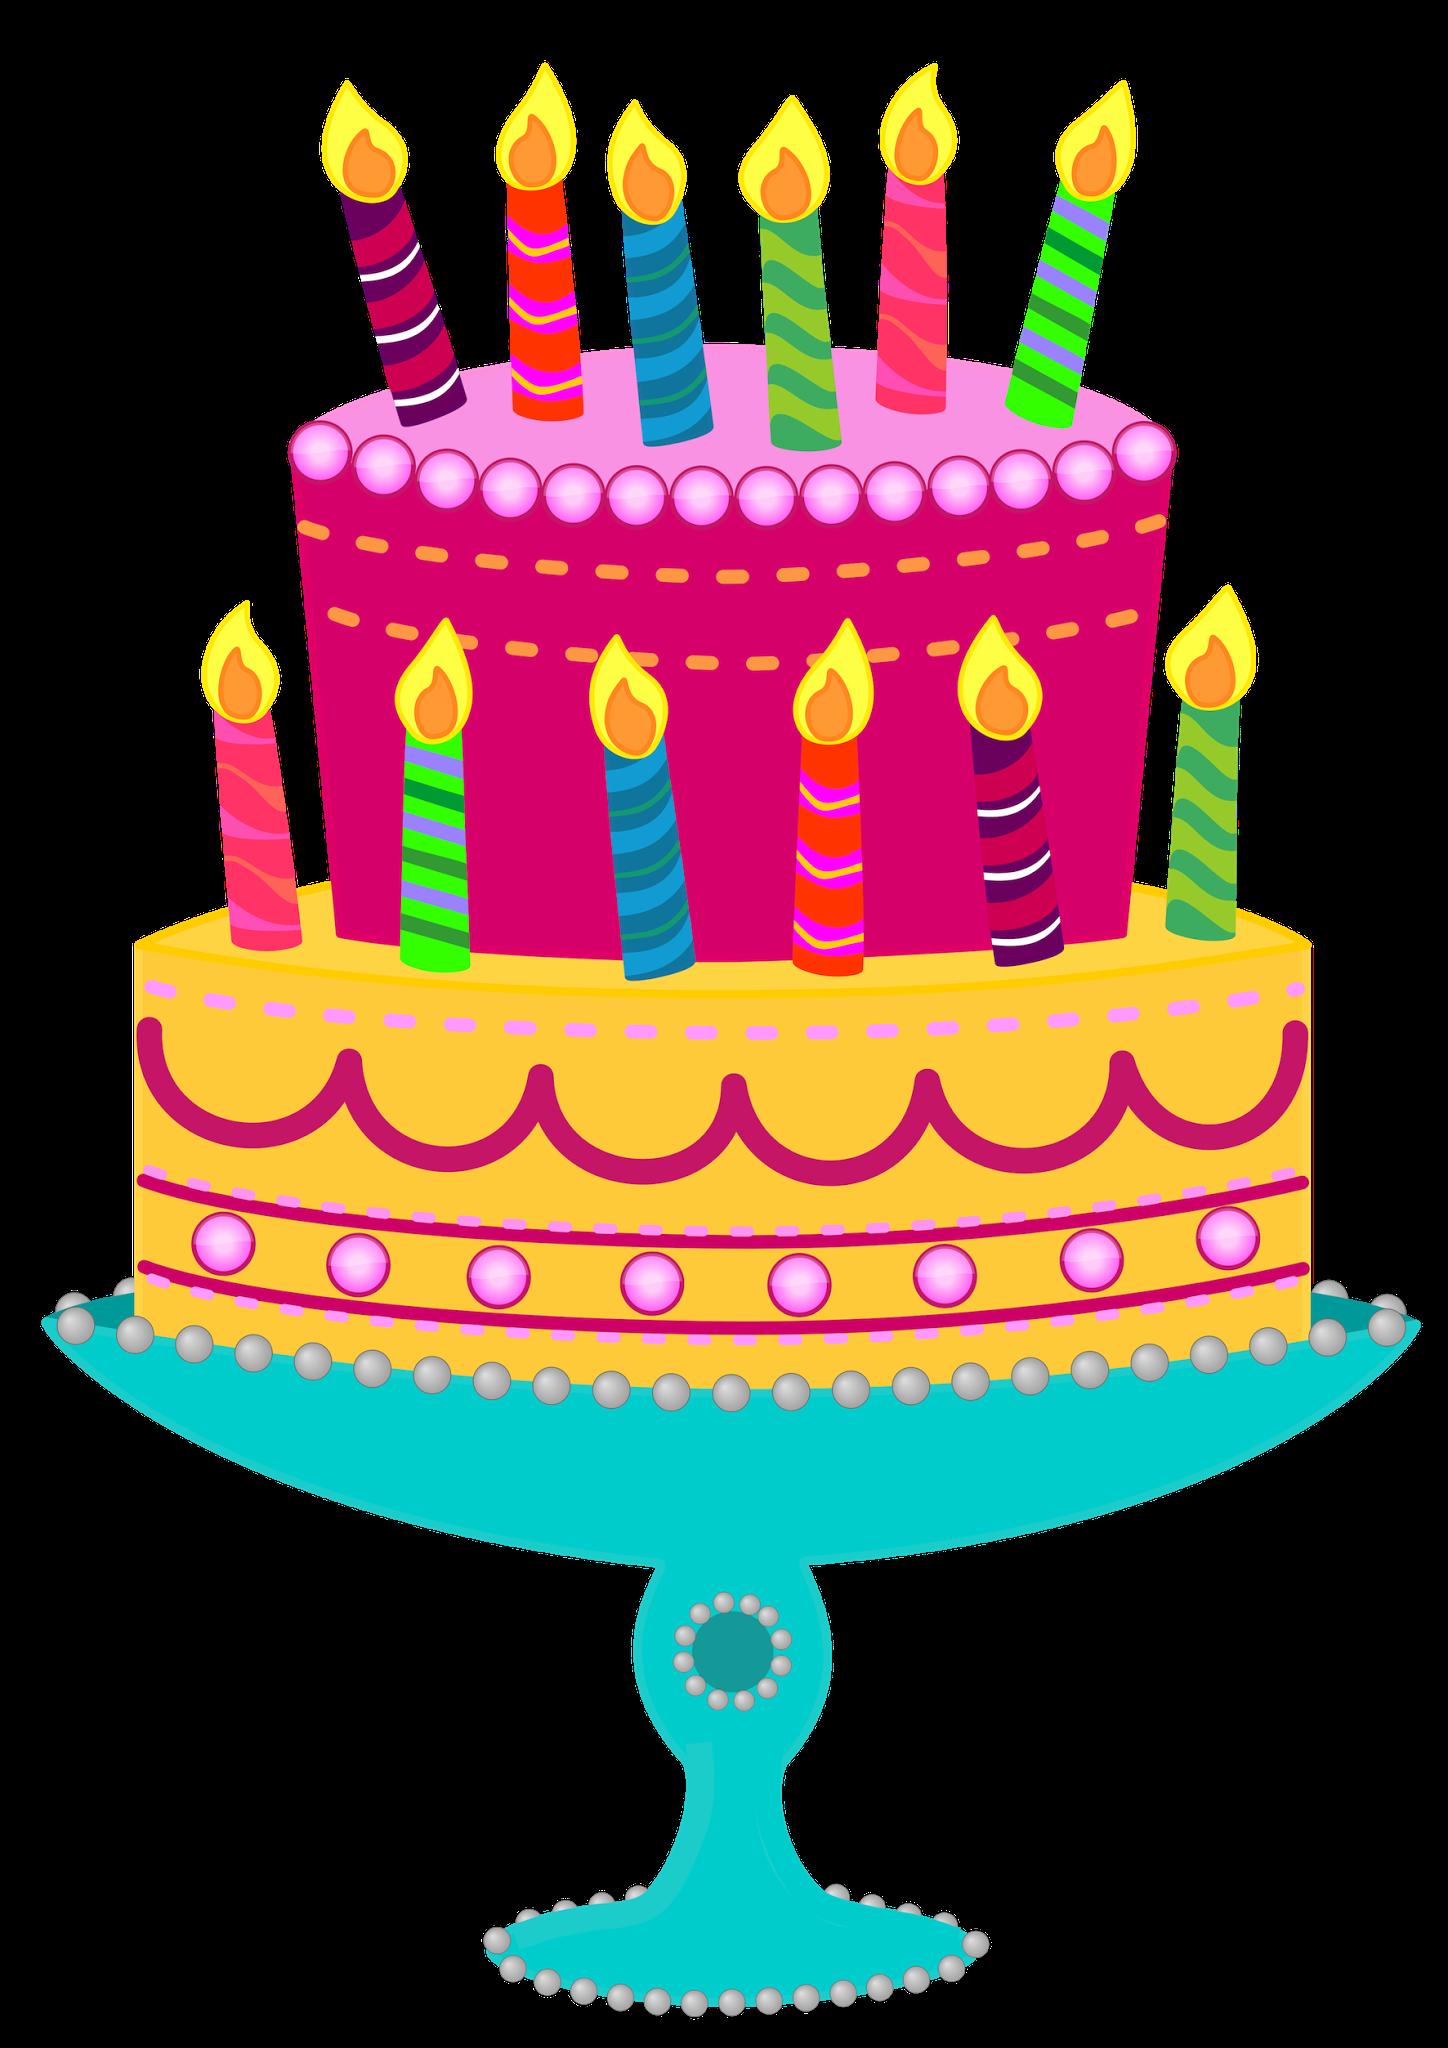 Free Cake Images